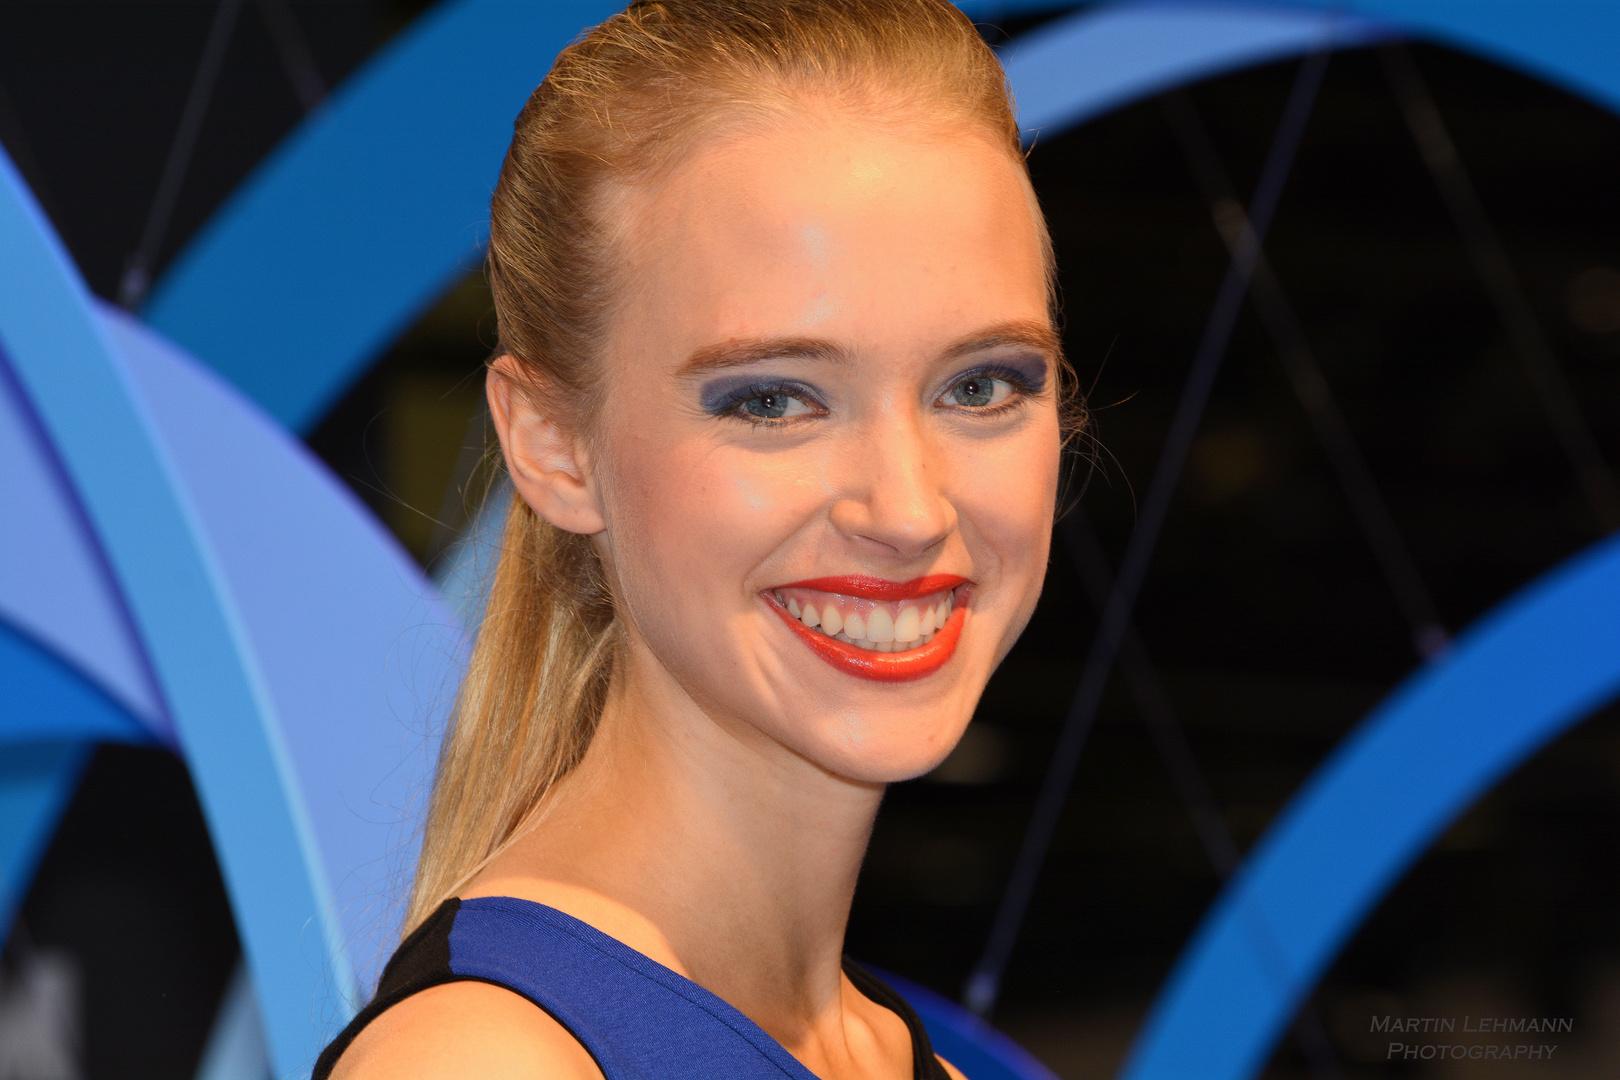 Photokina 2014 IV: Das perfekte Lächeln